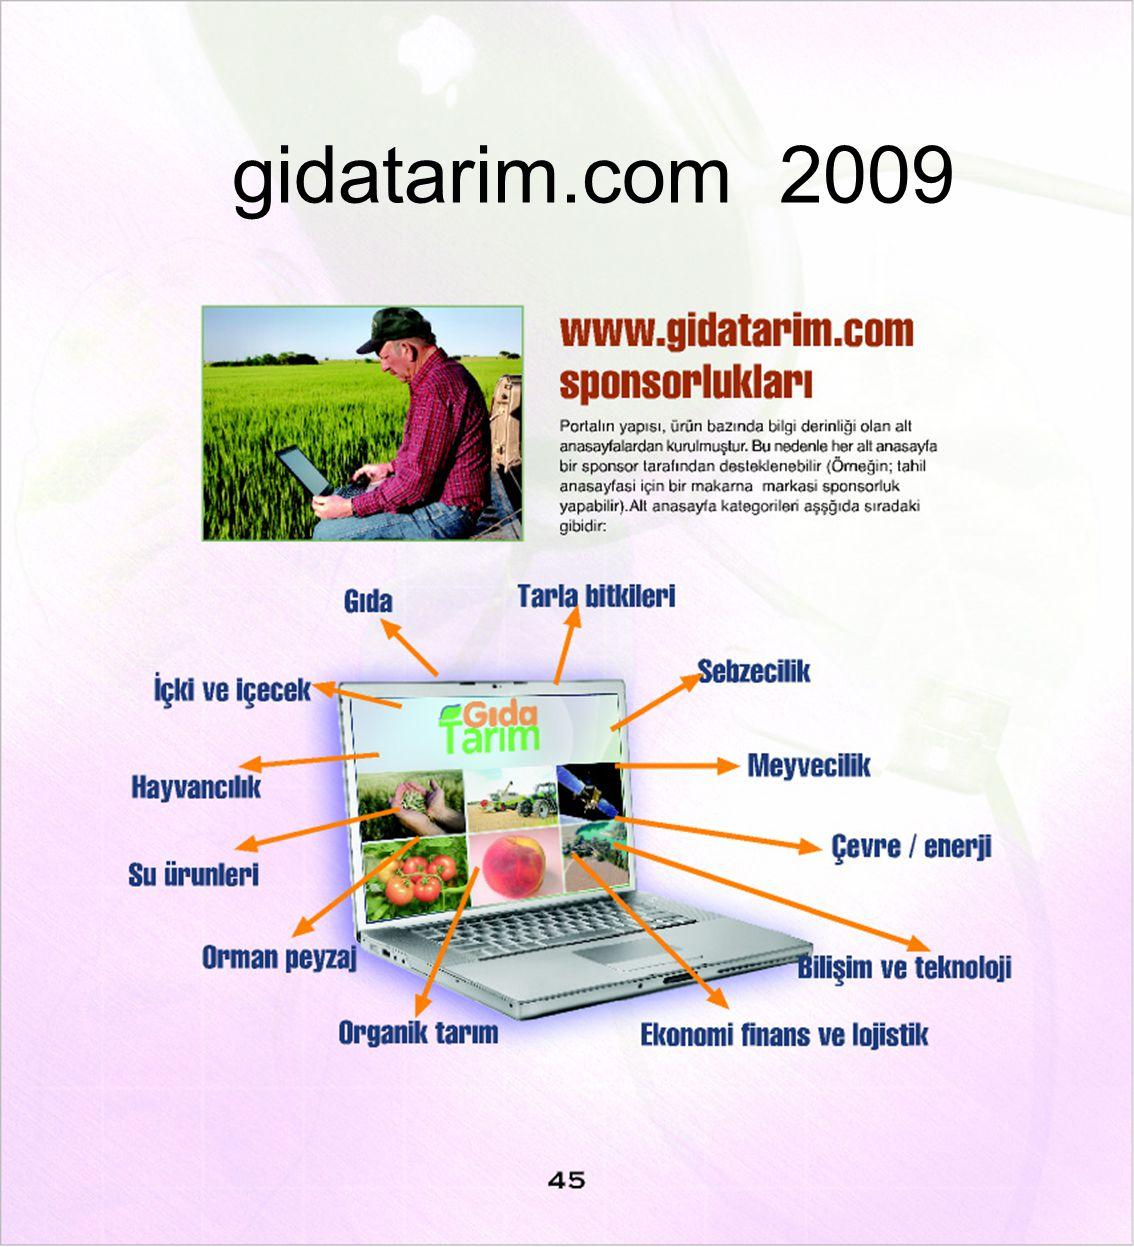 gidatarim.com 2009